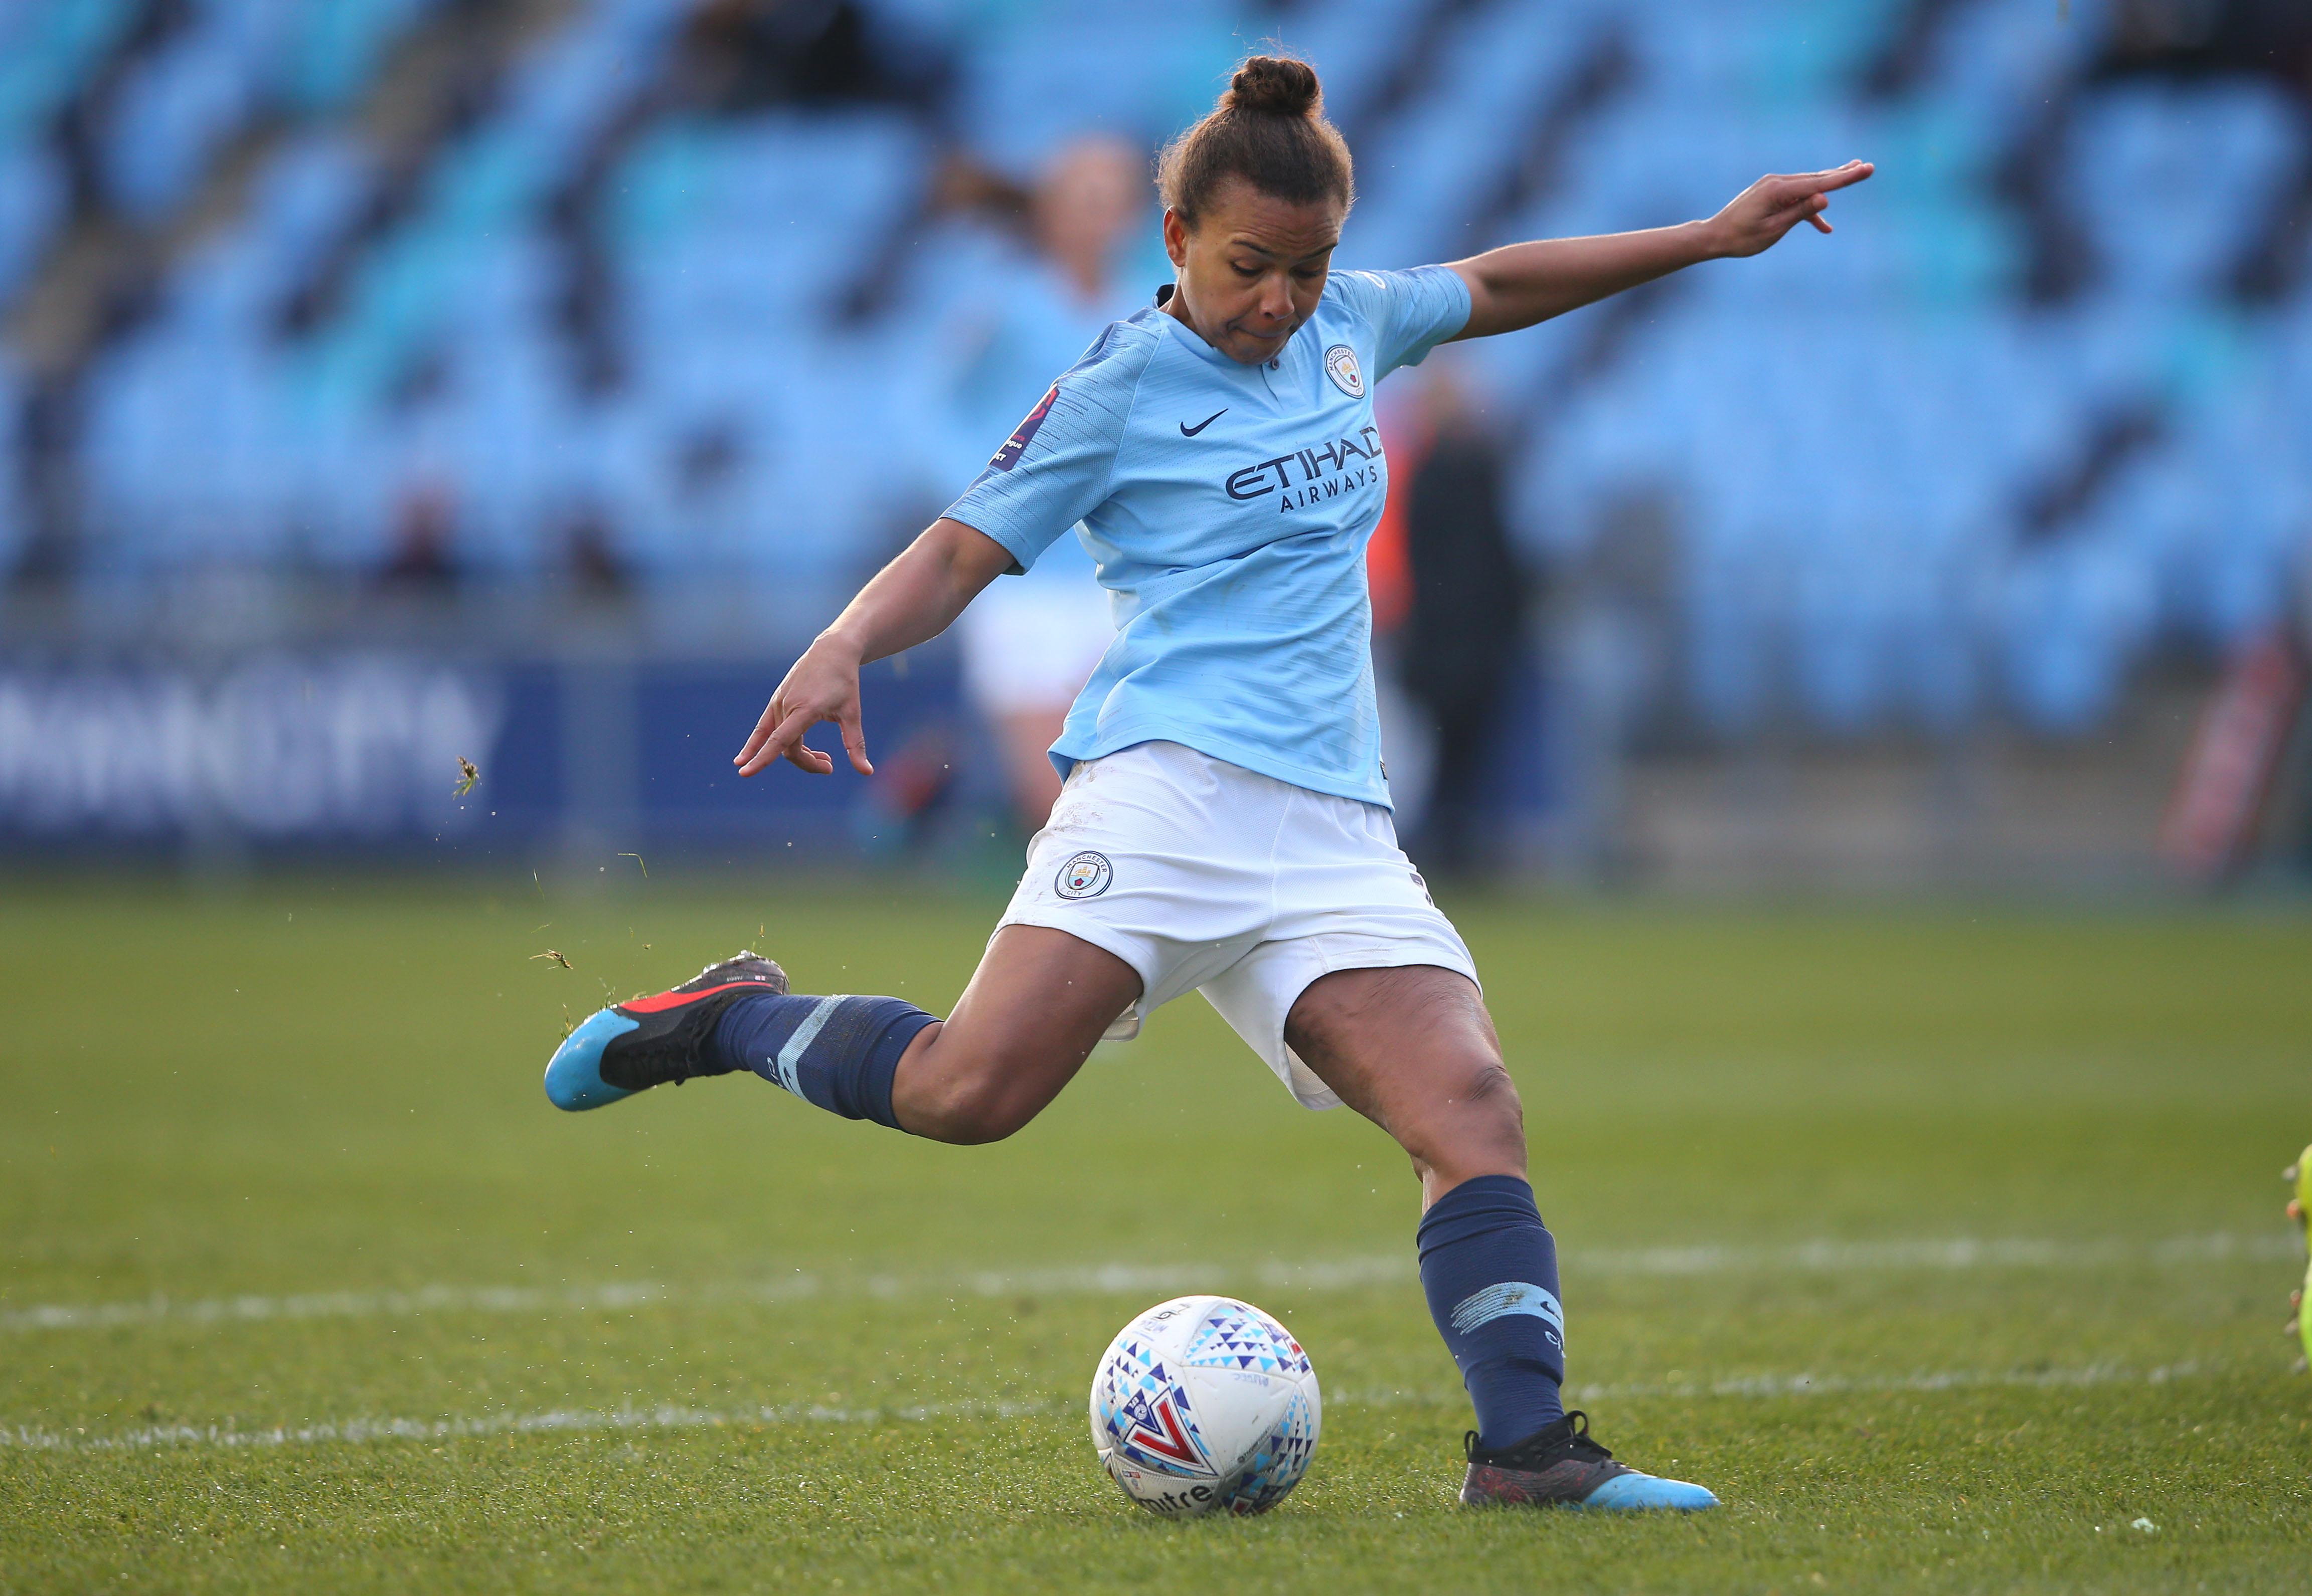 City Women remain unbeaten in WSL